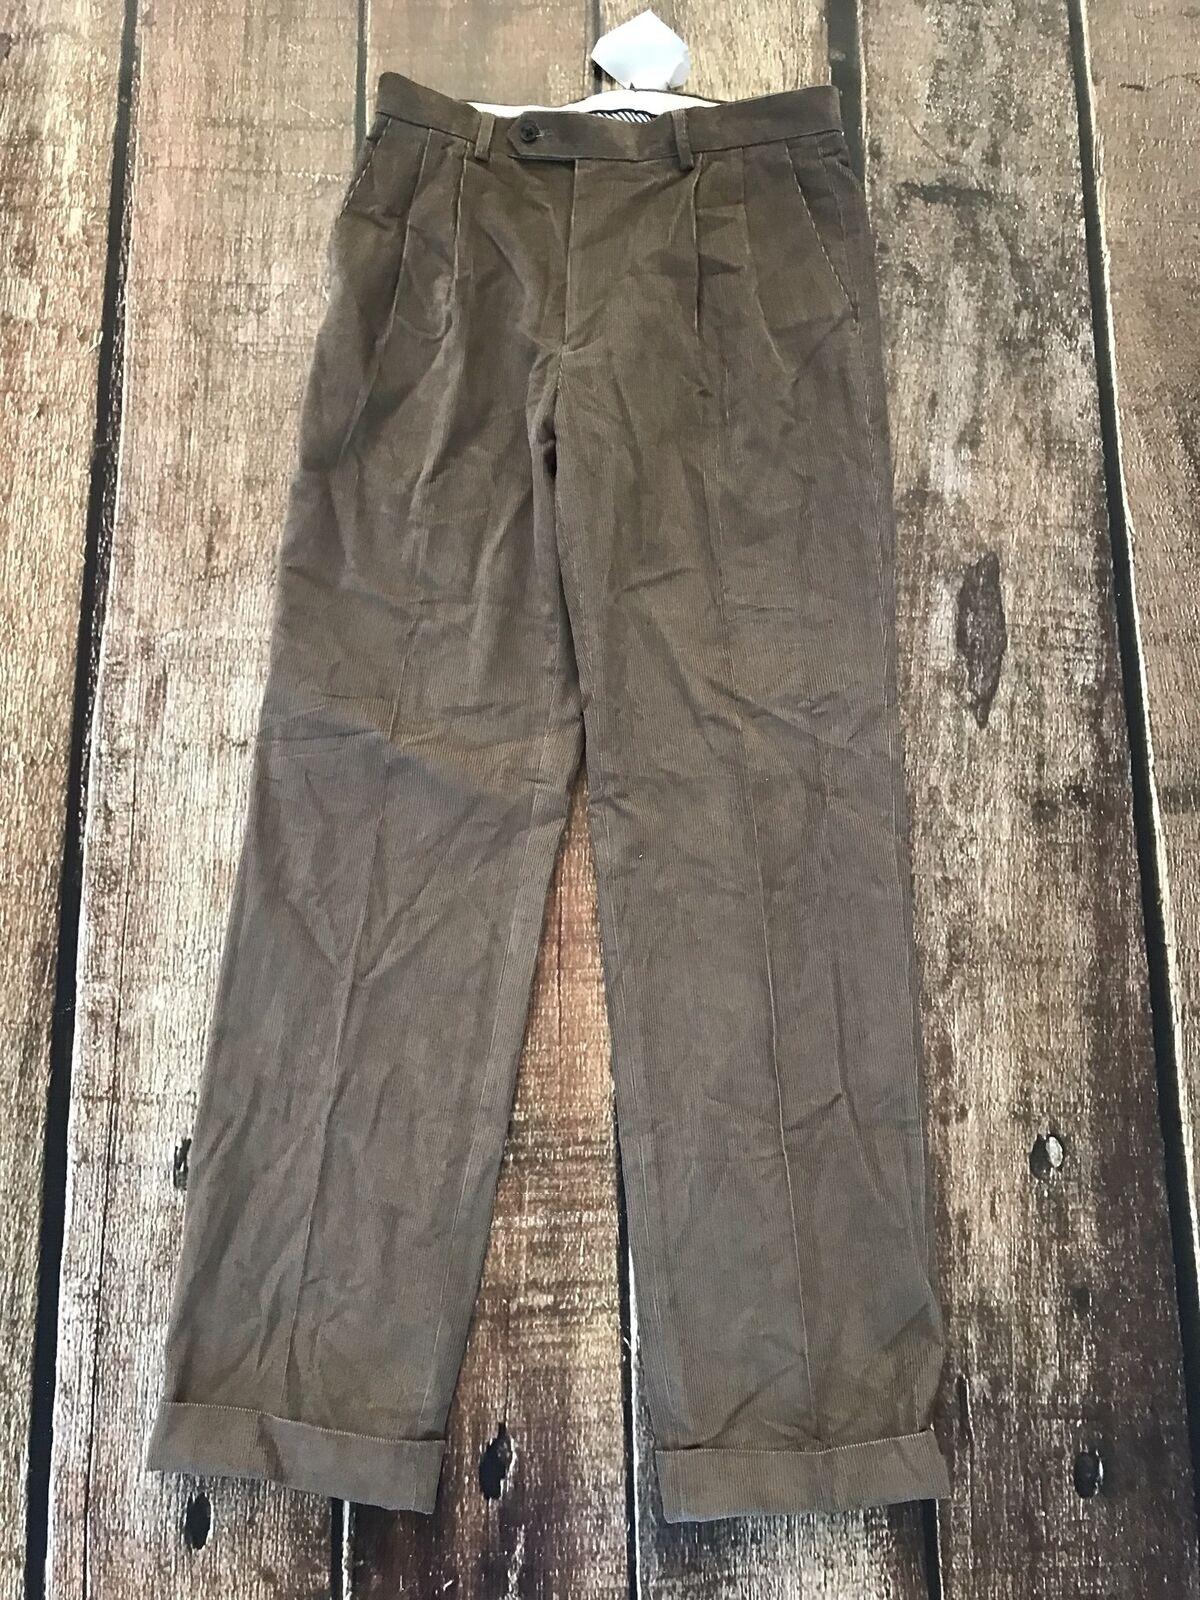 Lauren Ralph Lauren Pleated Corduroy Cuffed Dress Pants Tan Mens 38x29 New